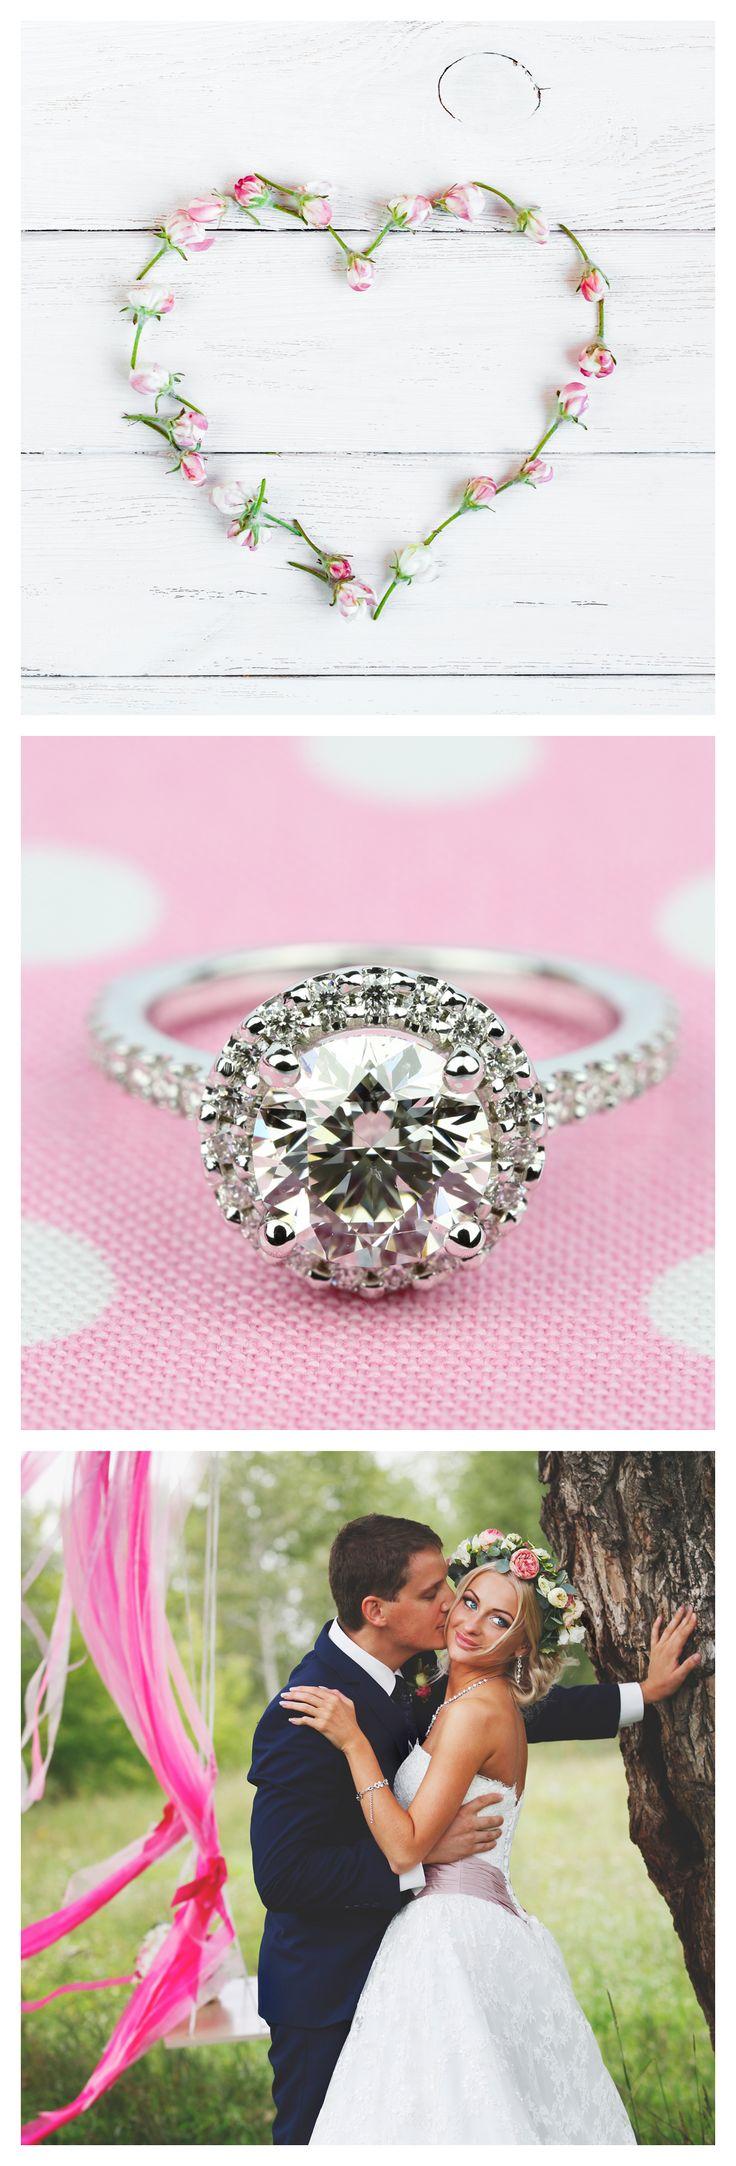 328 best Pink Wedding images on Pinterest | Pink weddings, Wedding ...